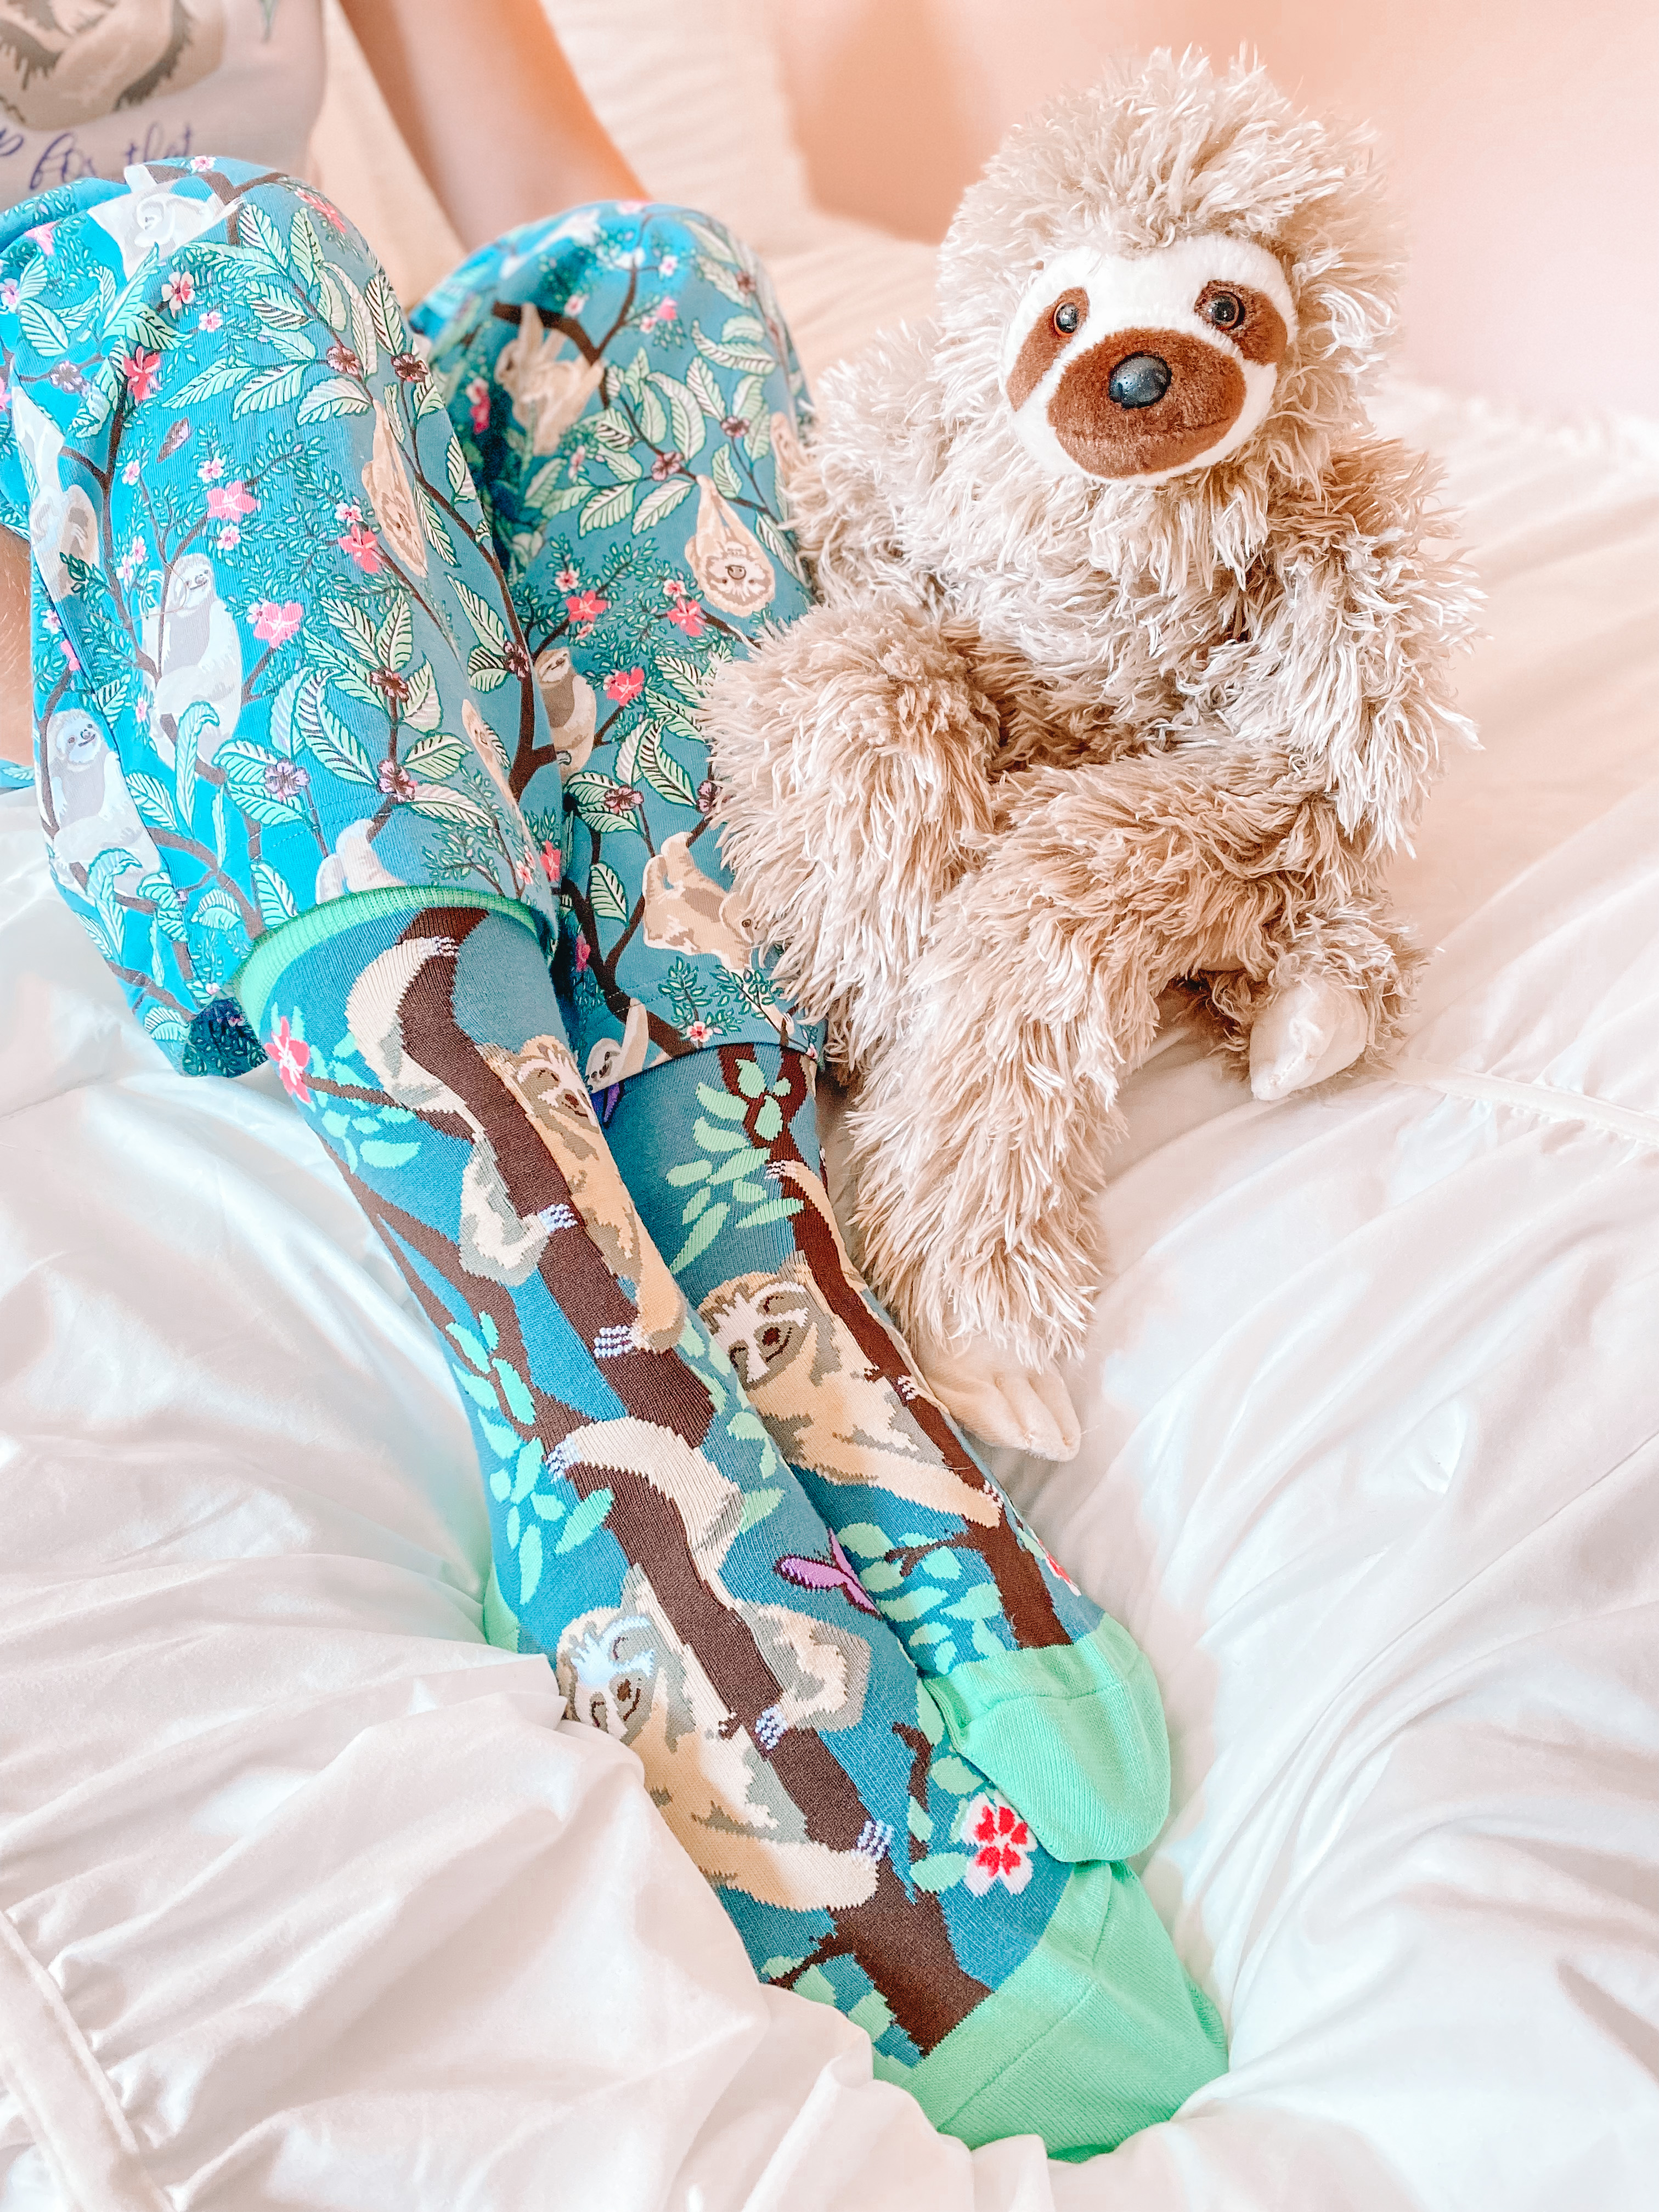 sloth boot socks and sloth toy